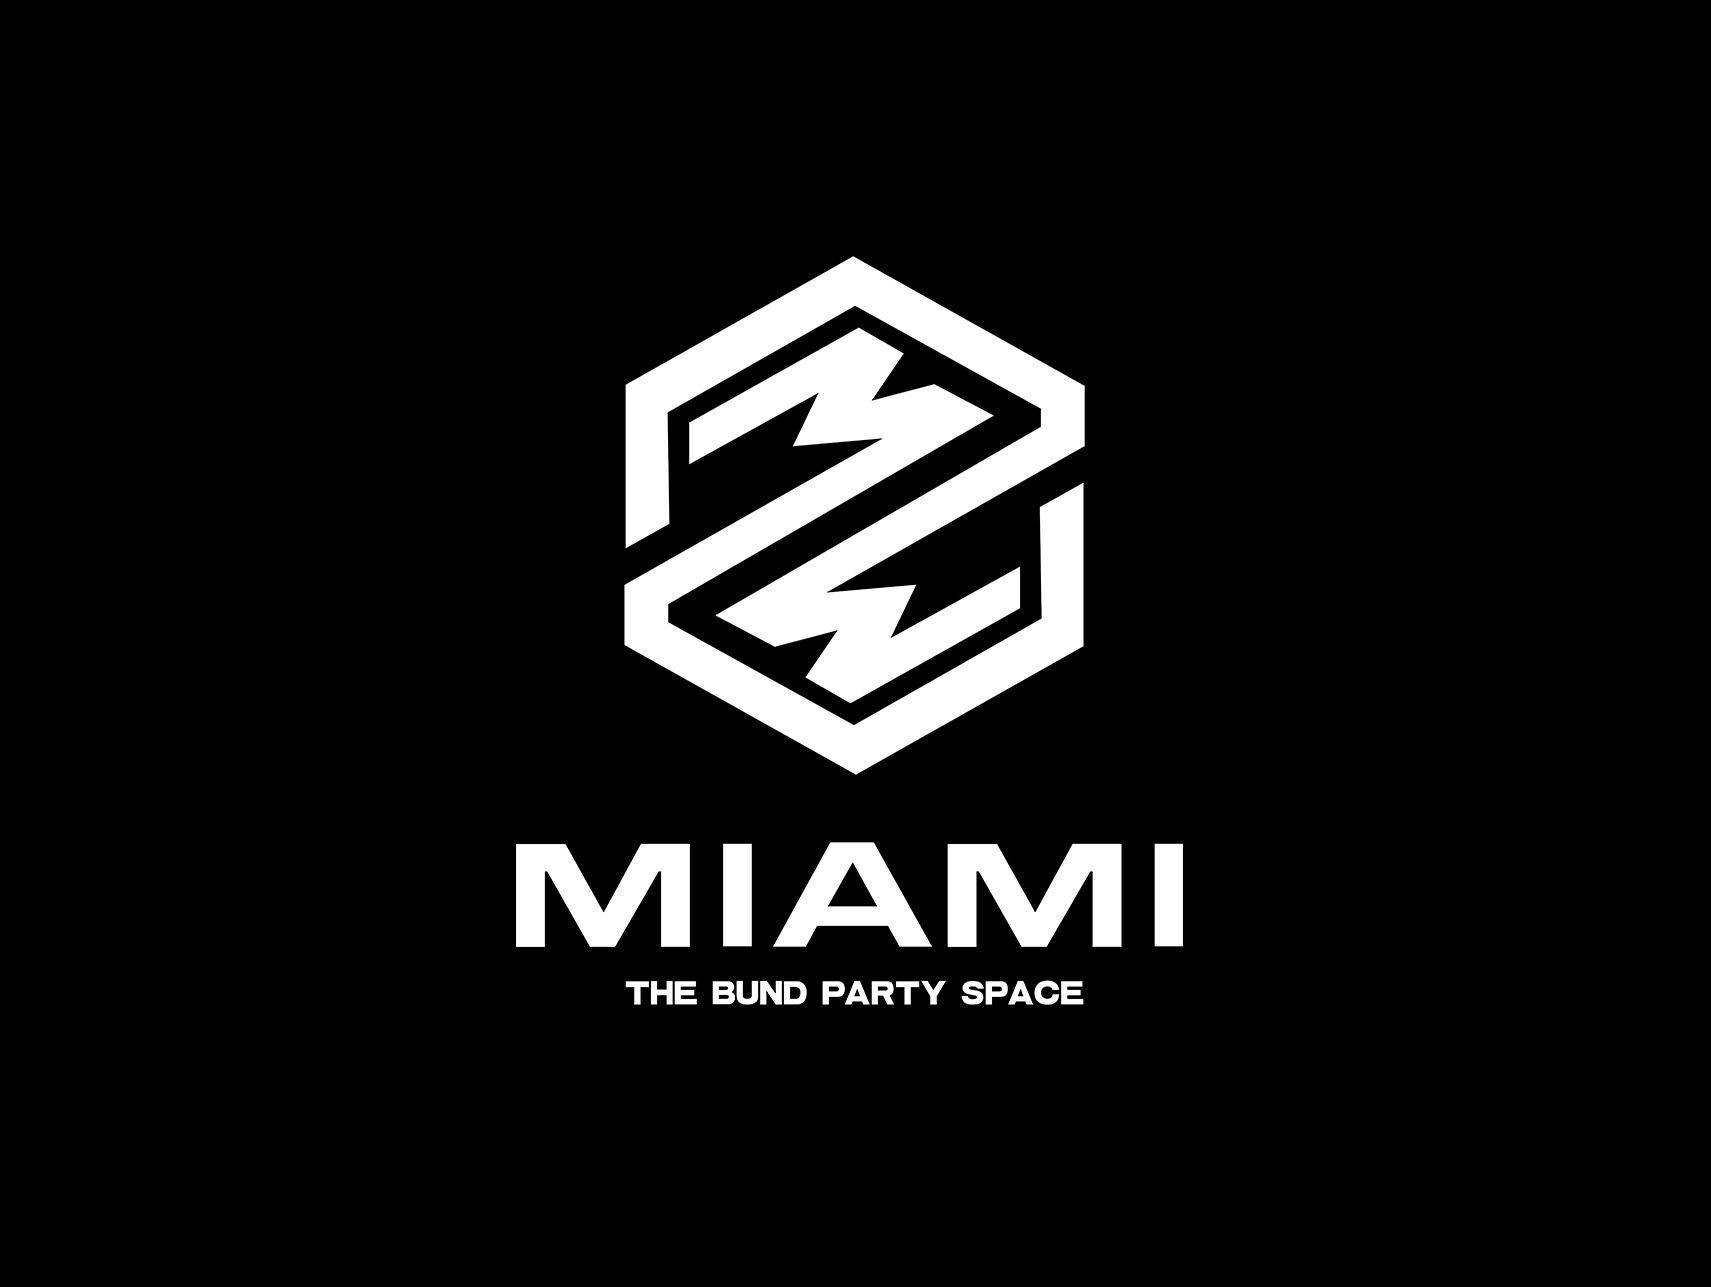 MIAMI CLUB 迈阿密酒吧